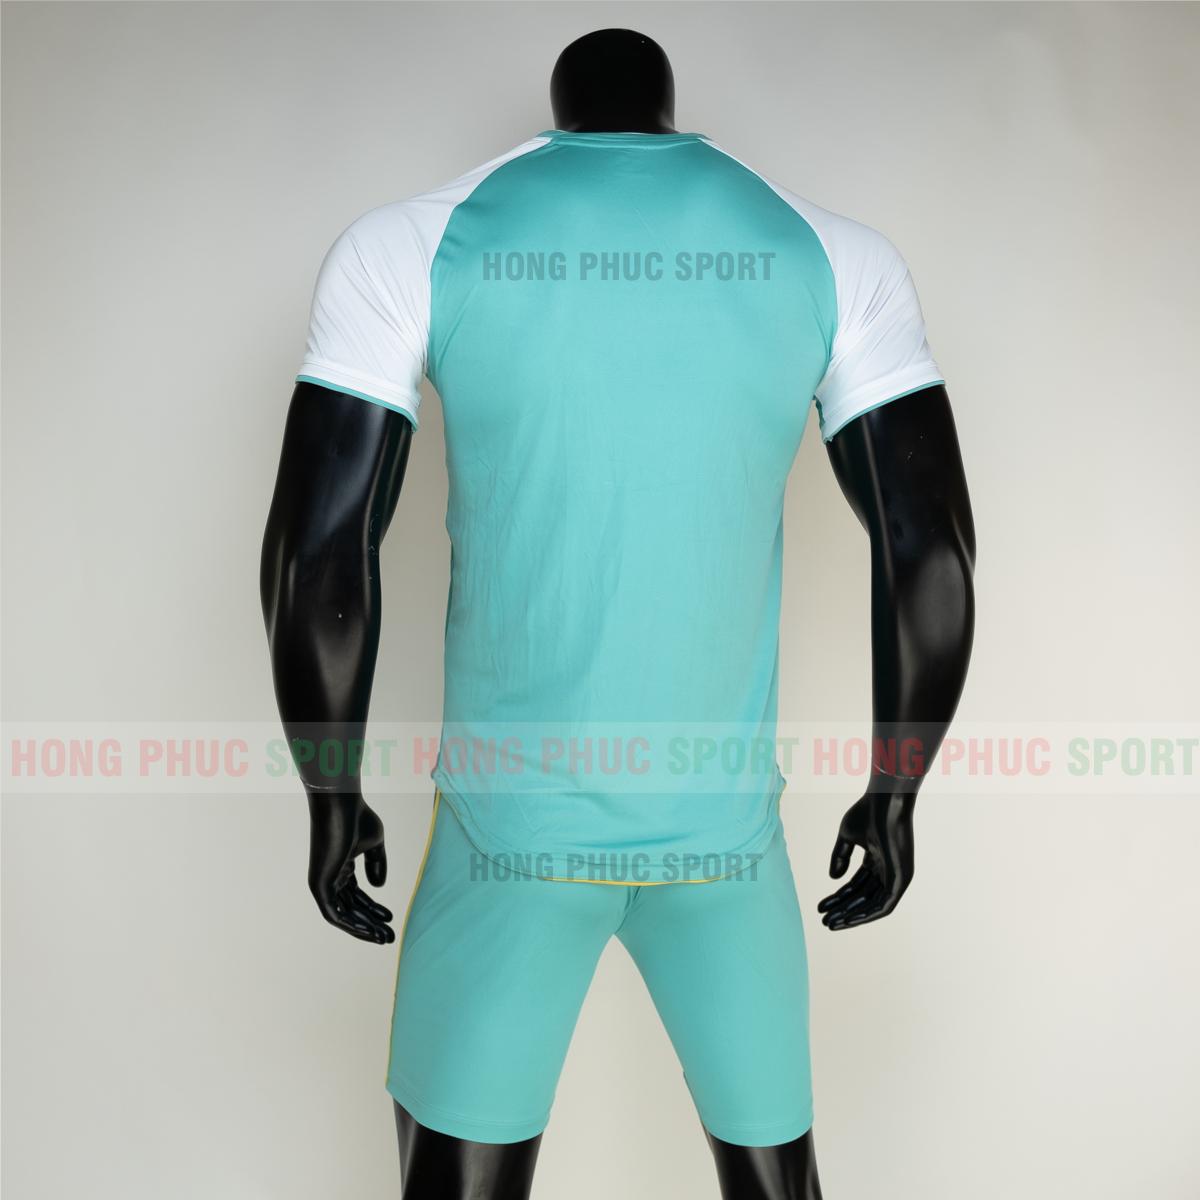 https://cdn.hongphucsport.com/unsafe/s4.shopbay.vn/files/285/ao-bong-da-khong-logo-riki-grambor-mau-xanh-ngoc-6-605061d162216.png